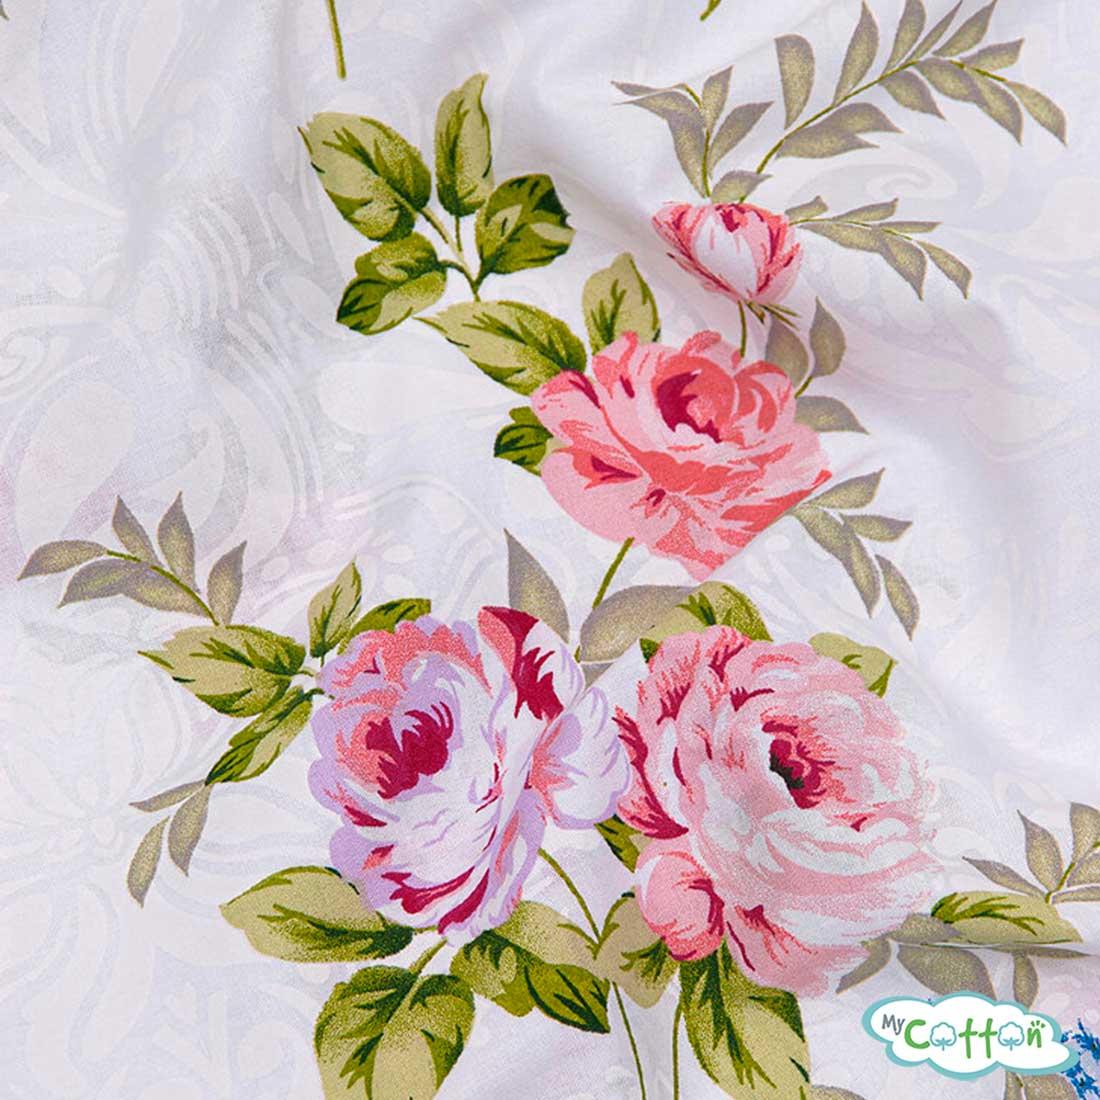 Постельное белье Kristelleколлекция Marilyn Monroe5